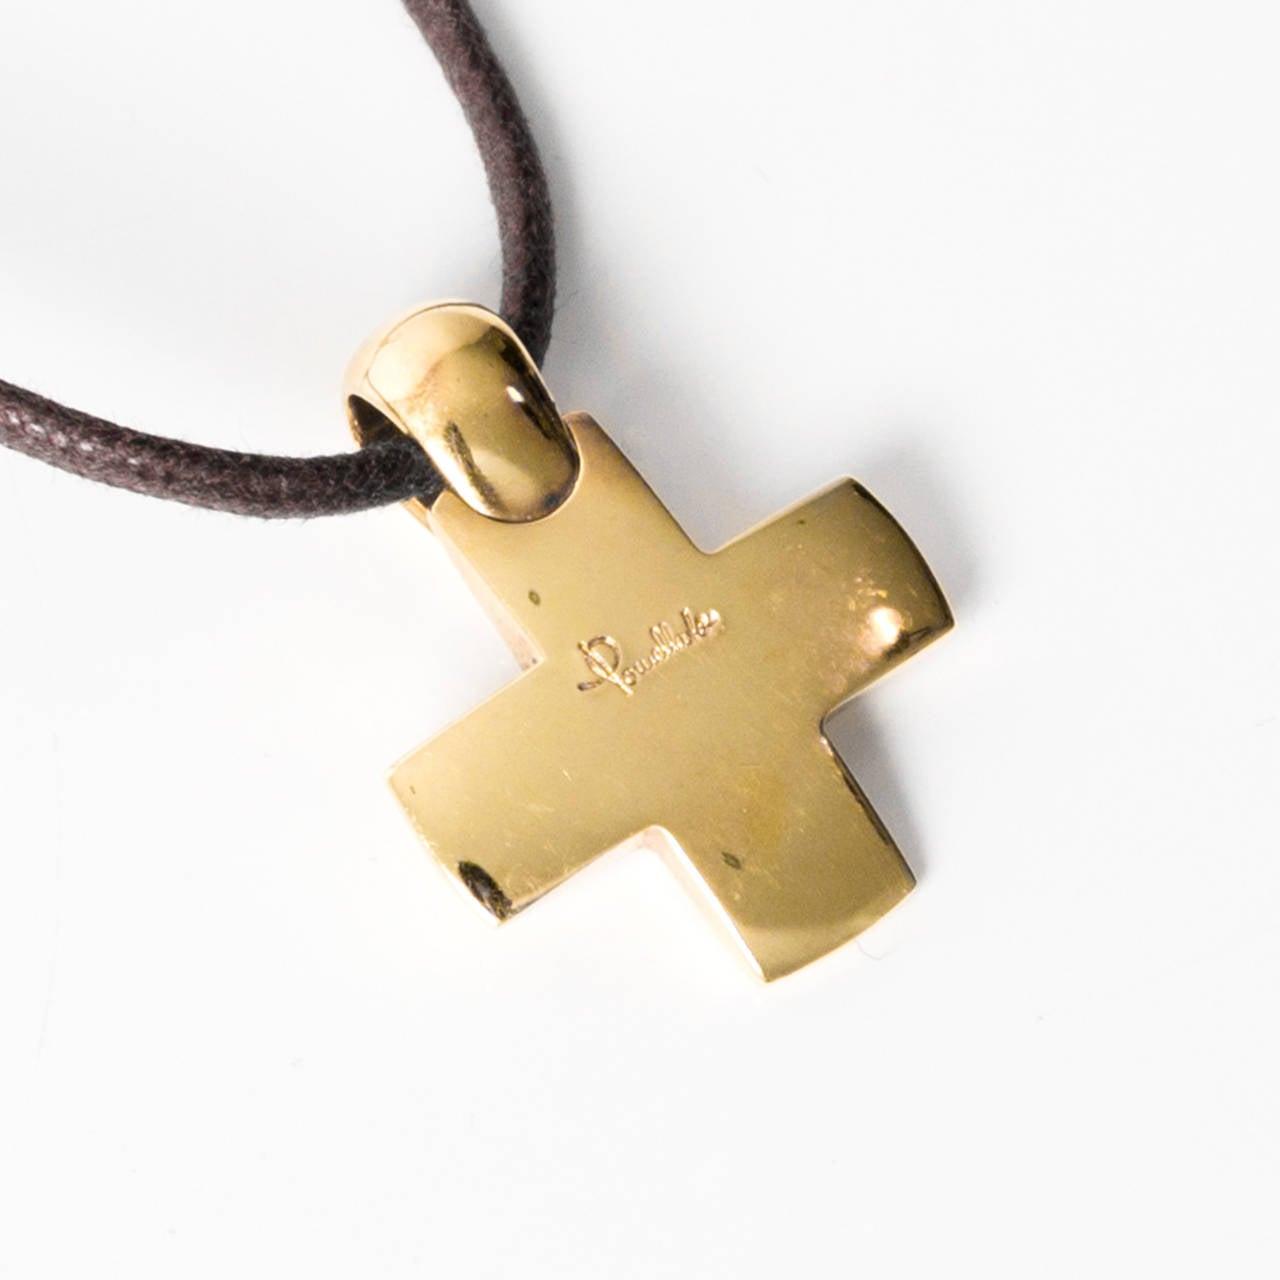 Pomellato 18k yellow gold cross pendant necklace at 1stdibs pomellato 18k yellow gold cross pendant necklace 3 aloadofball Images